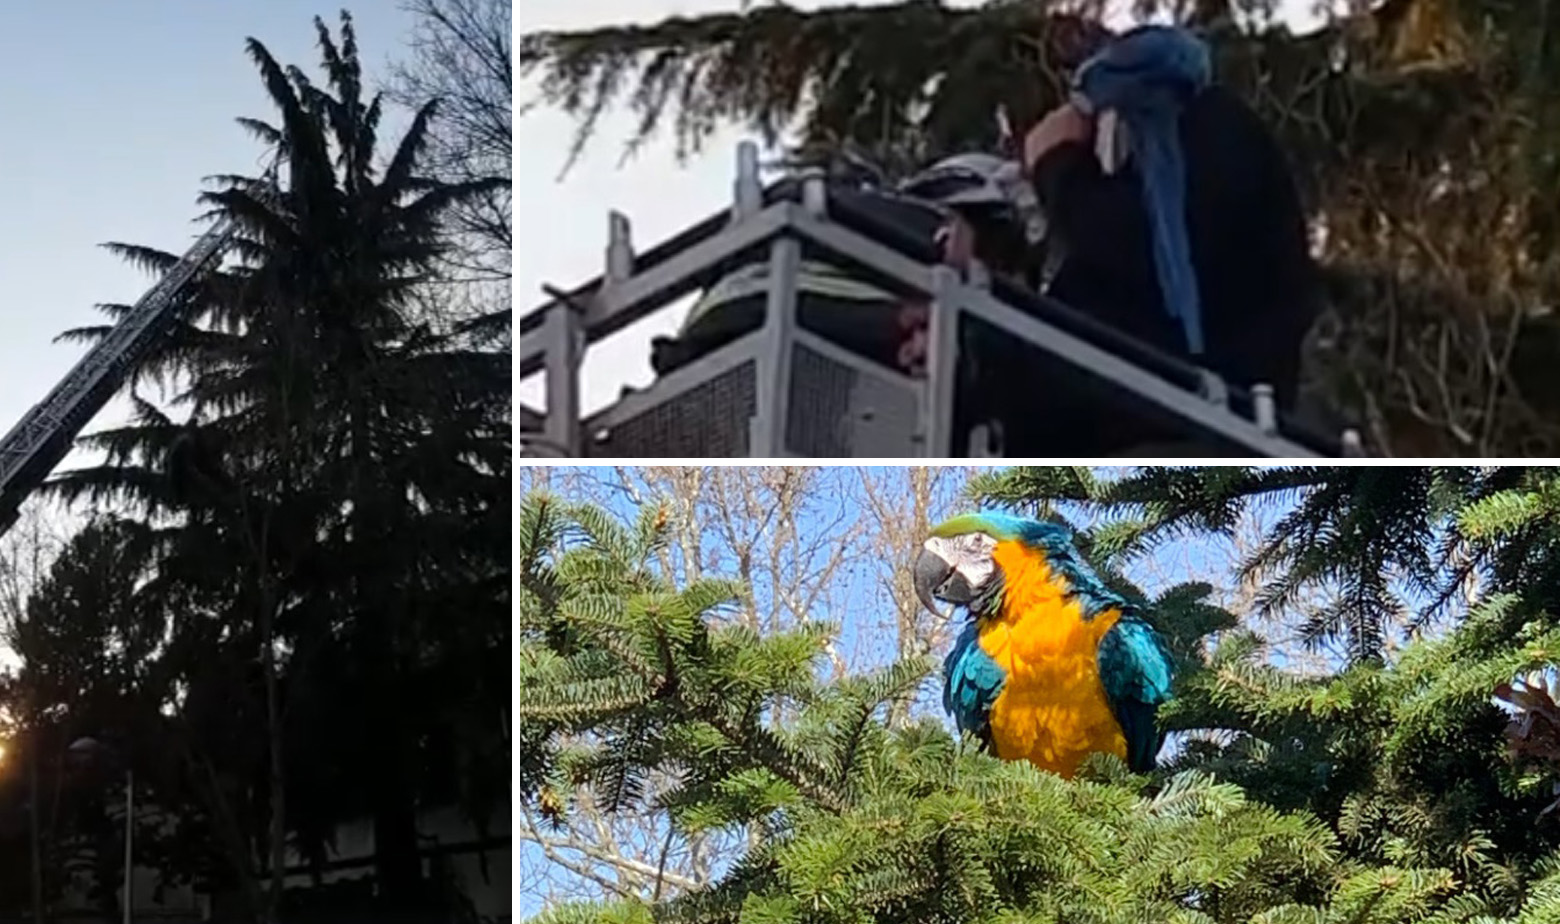 Spašavanje papagaja Jacka